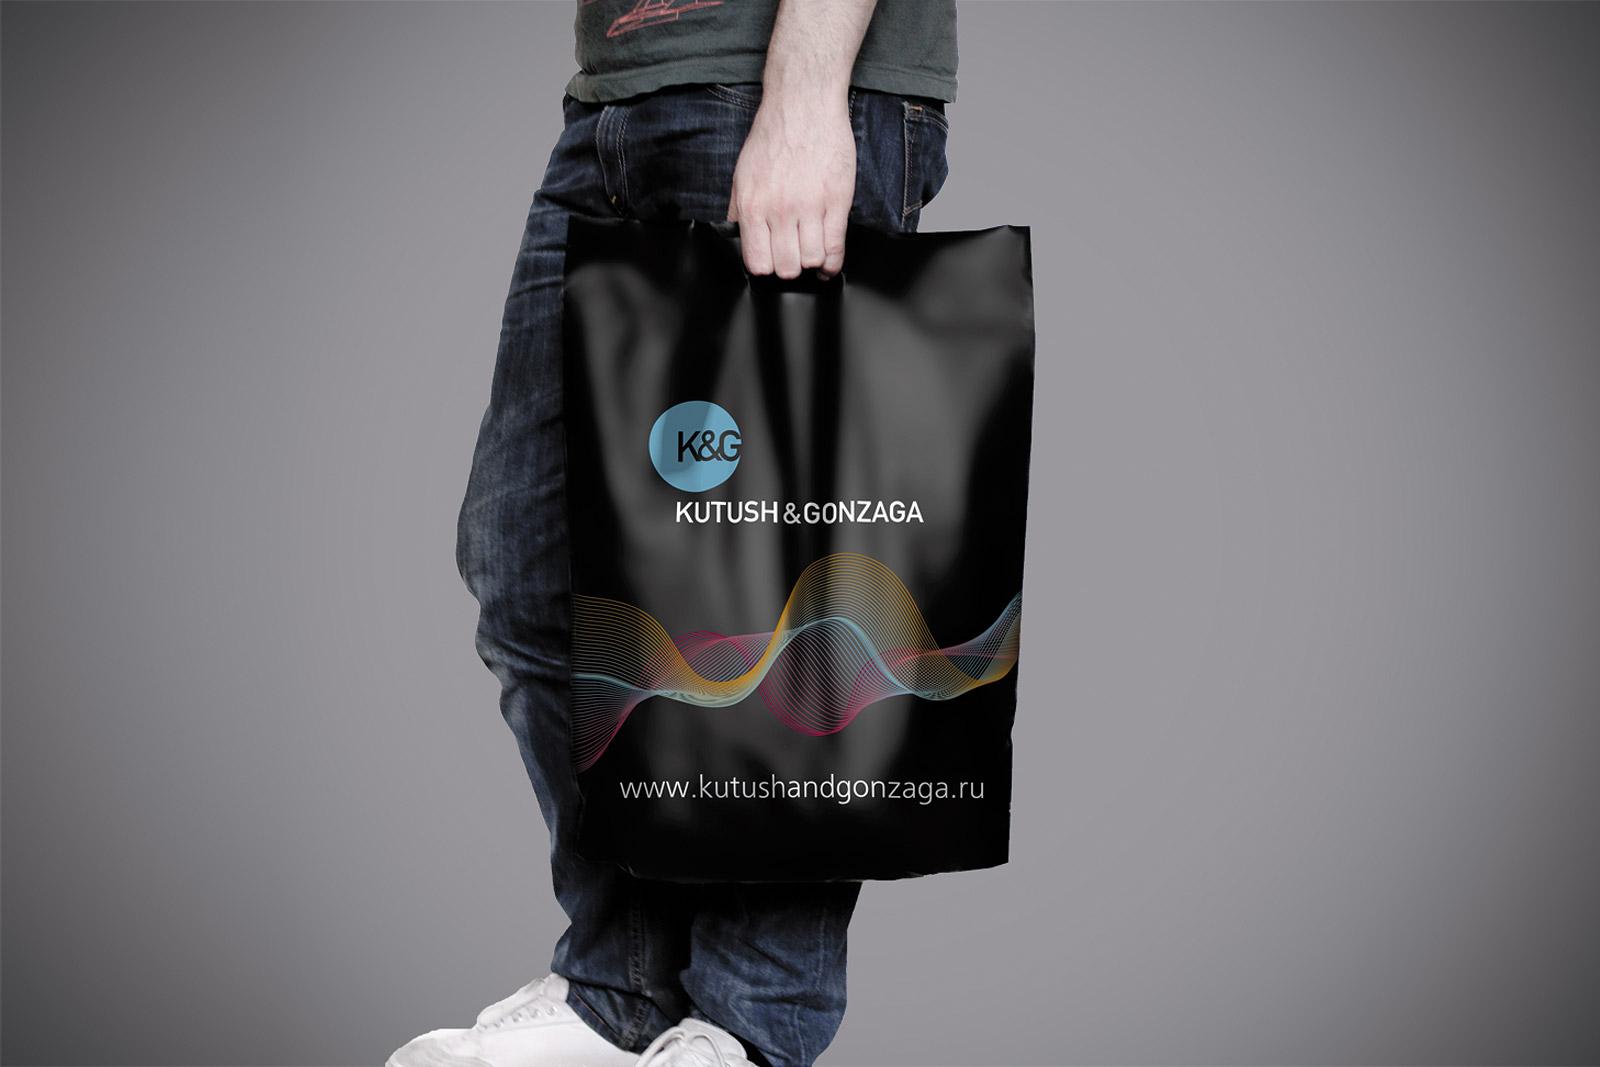 Асгард Брендинг, фирменный стиль, айдентика, лого, K&G, Kutush & Gonzaga, дизайн упаковки, брендинг пакетов, корпоративный стиль